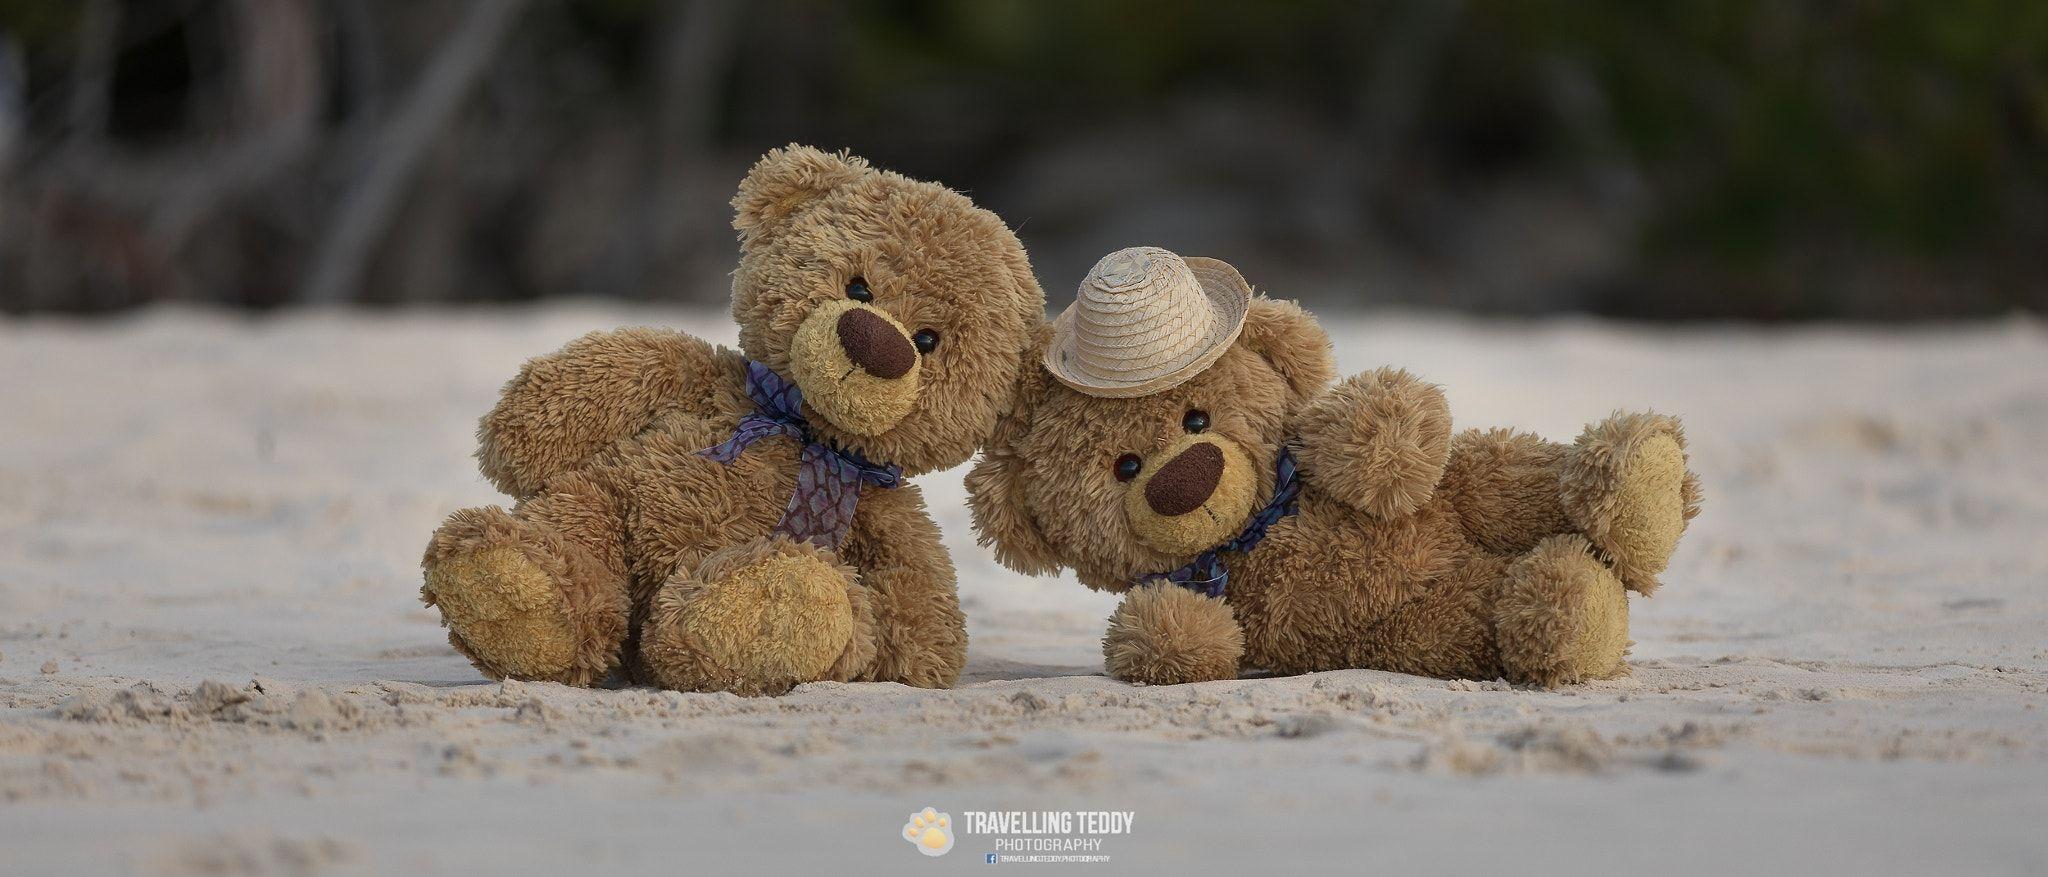 BearTatty NullTeddy Bear And Sulla spiaggia 0XPnwOk8